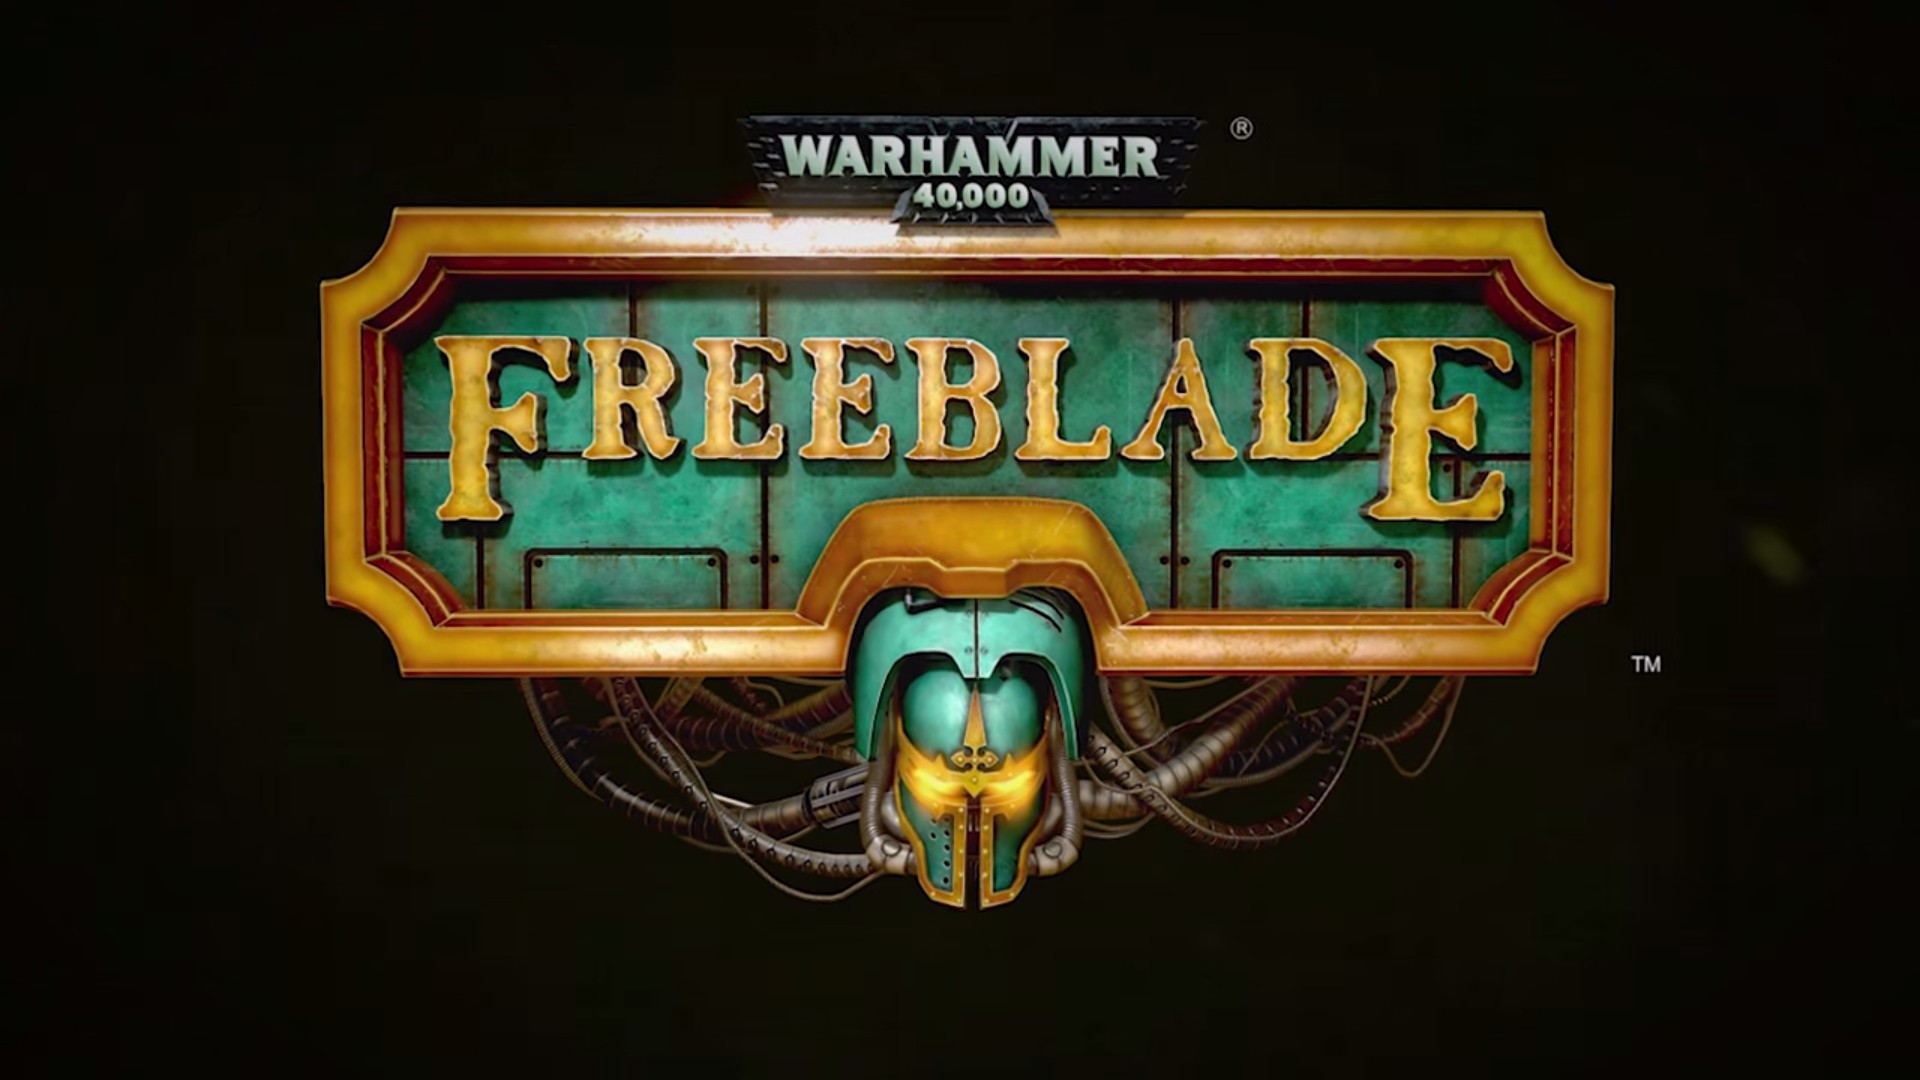 Warhammer 40.000: Freeblade, trailer di lancio